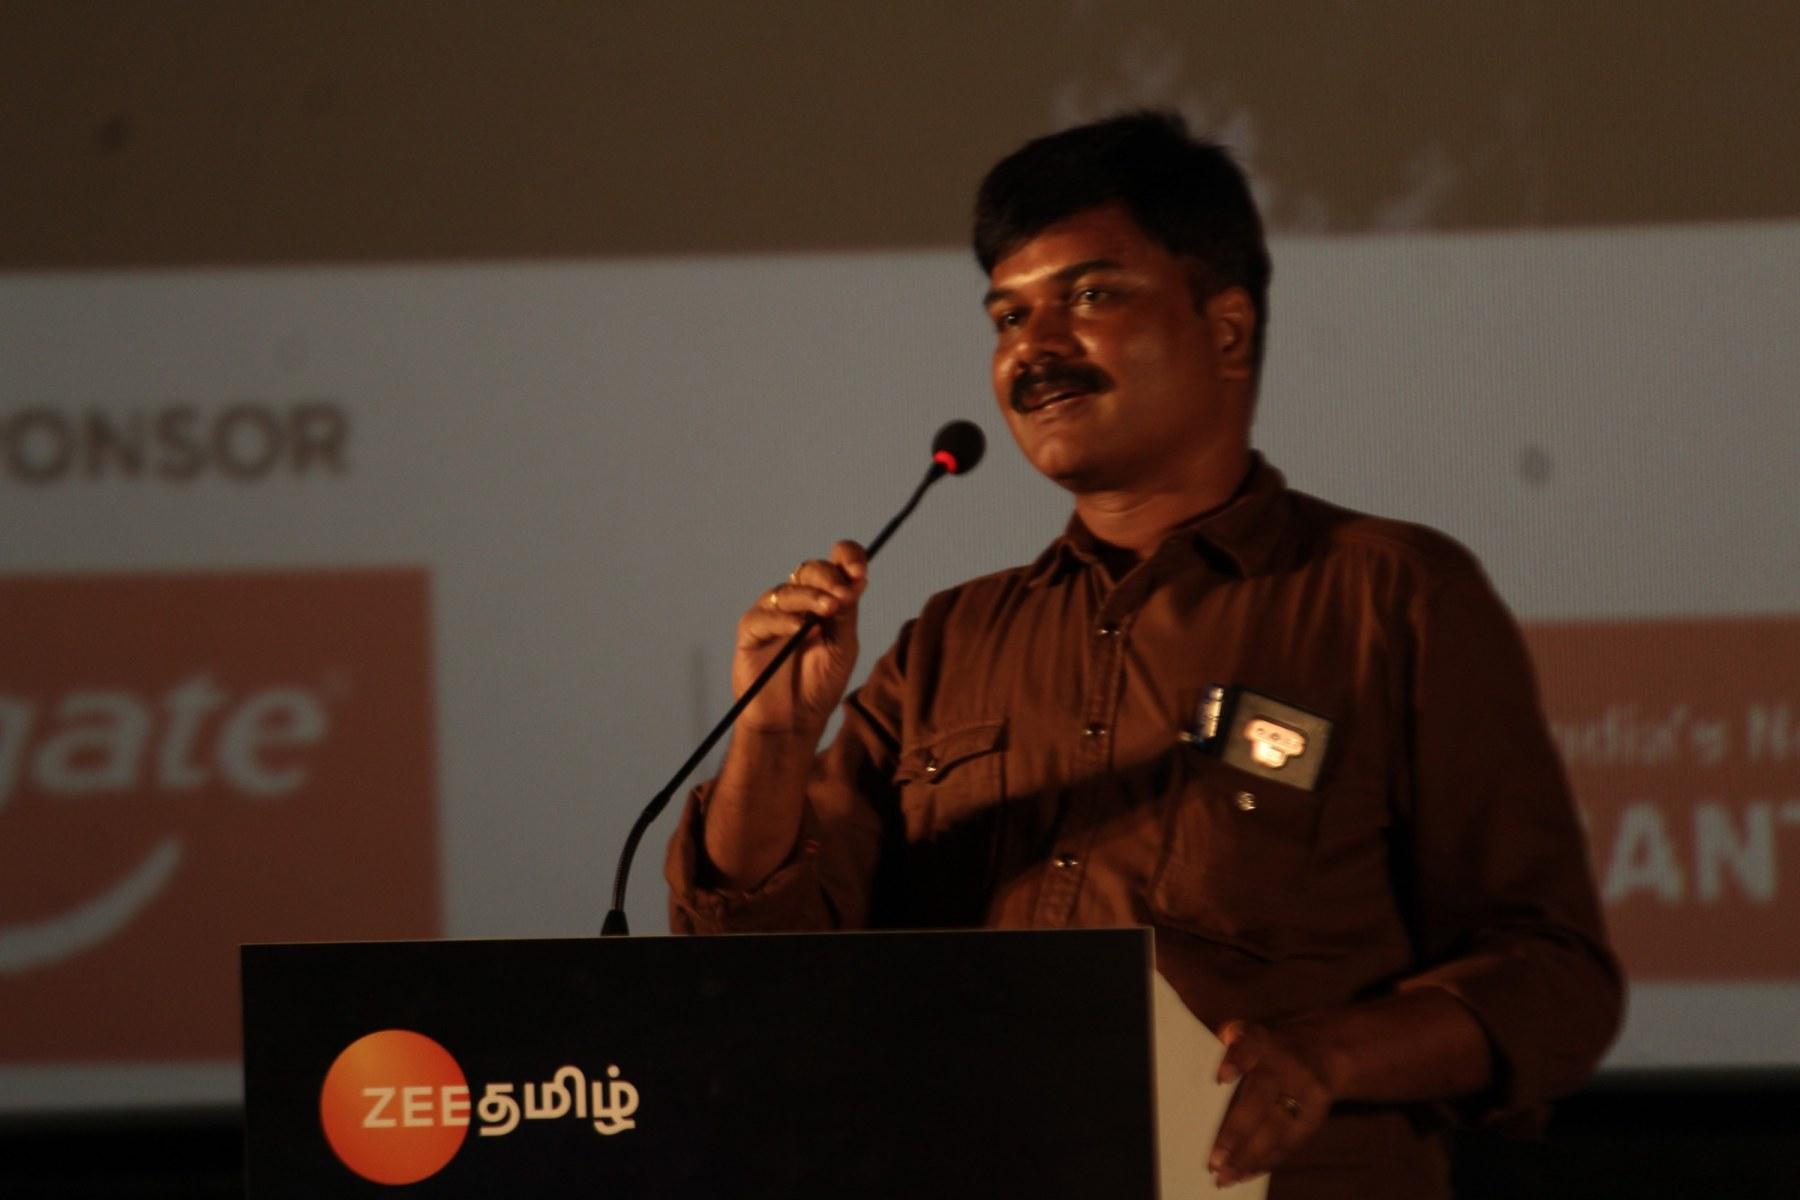 Rockstar-Music-reality-show-in-Zee-Tamil-4